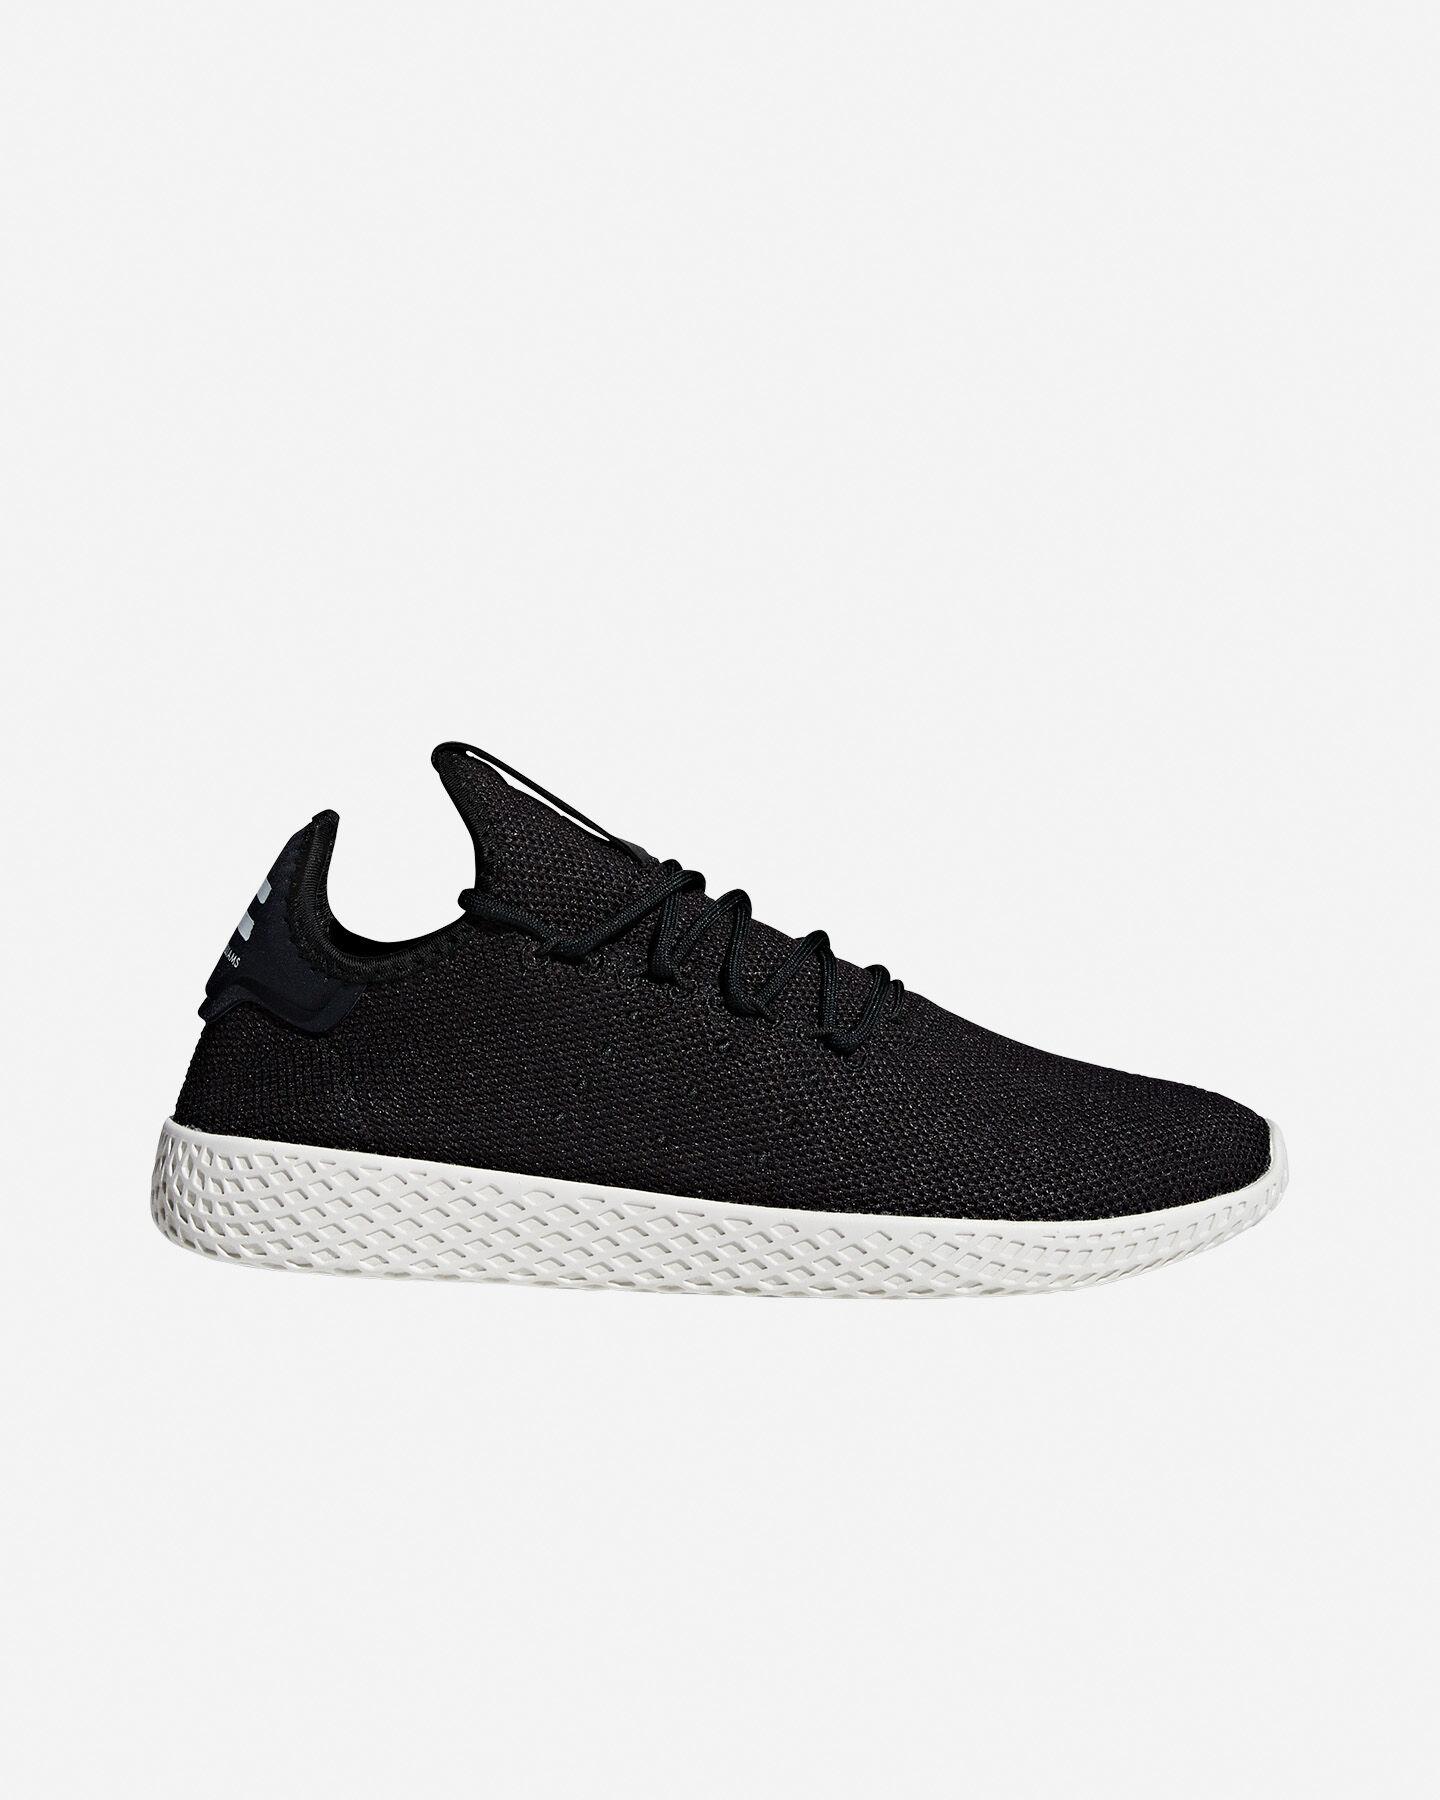 Scarpe Sneakers Adidas Pharrell Williams Tennis Hu M AQ1056